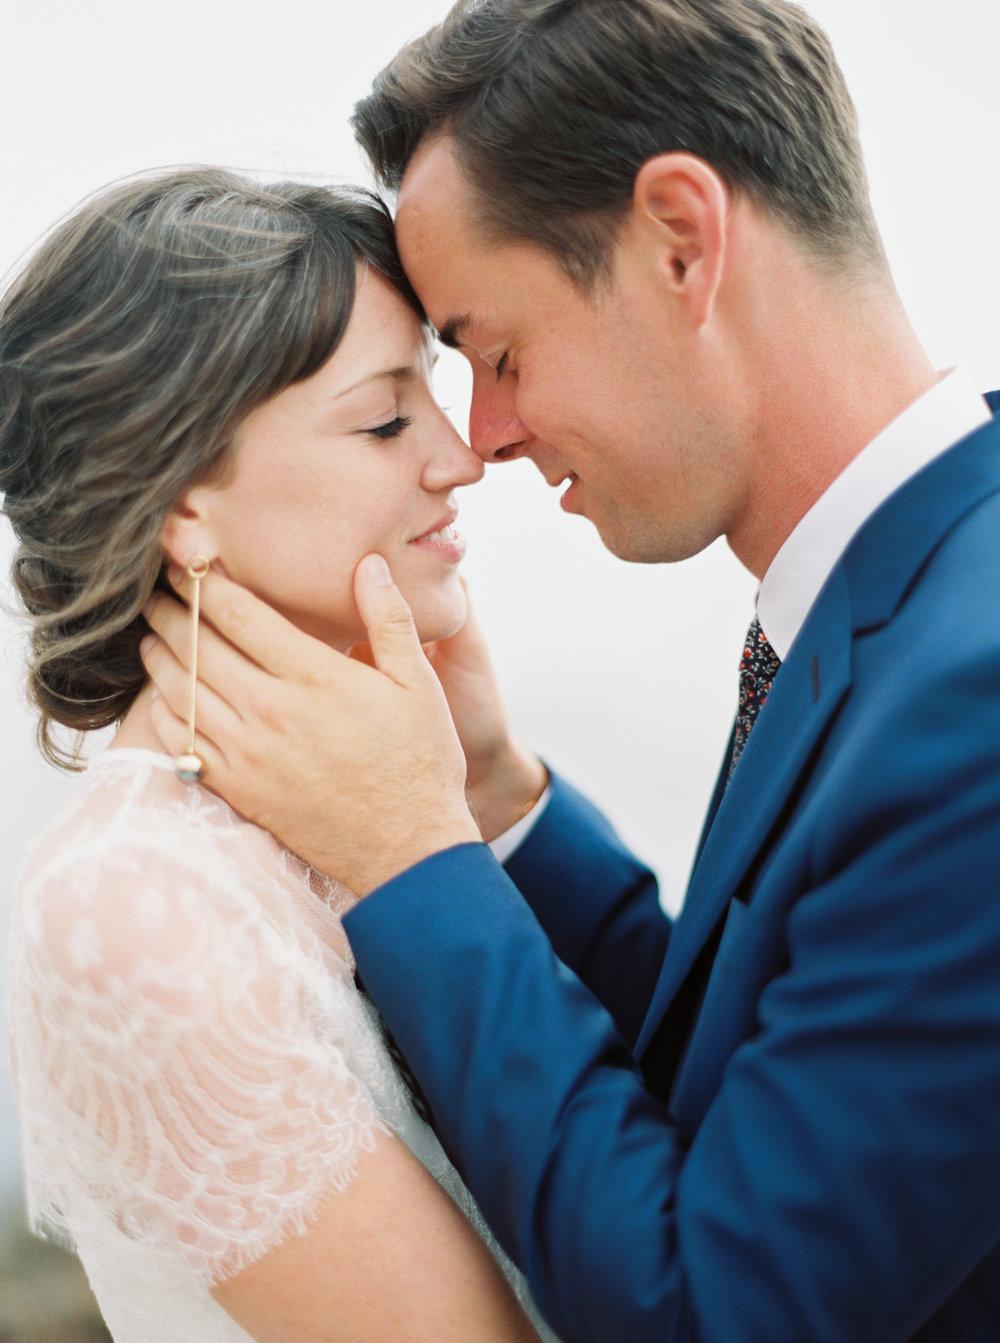 12th-Table-BIG-SUR-WEDDING-Erich-McVey-14